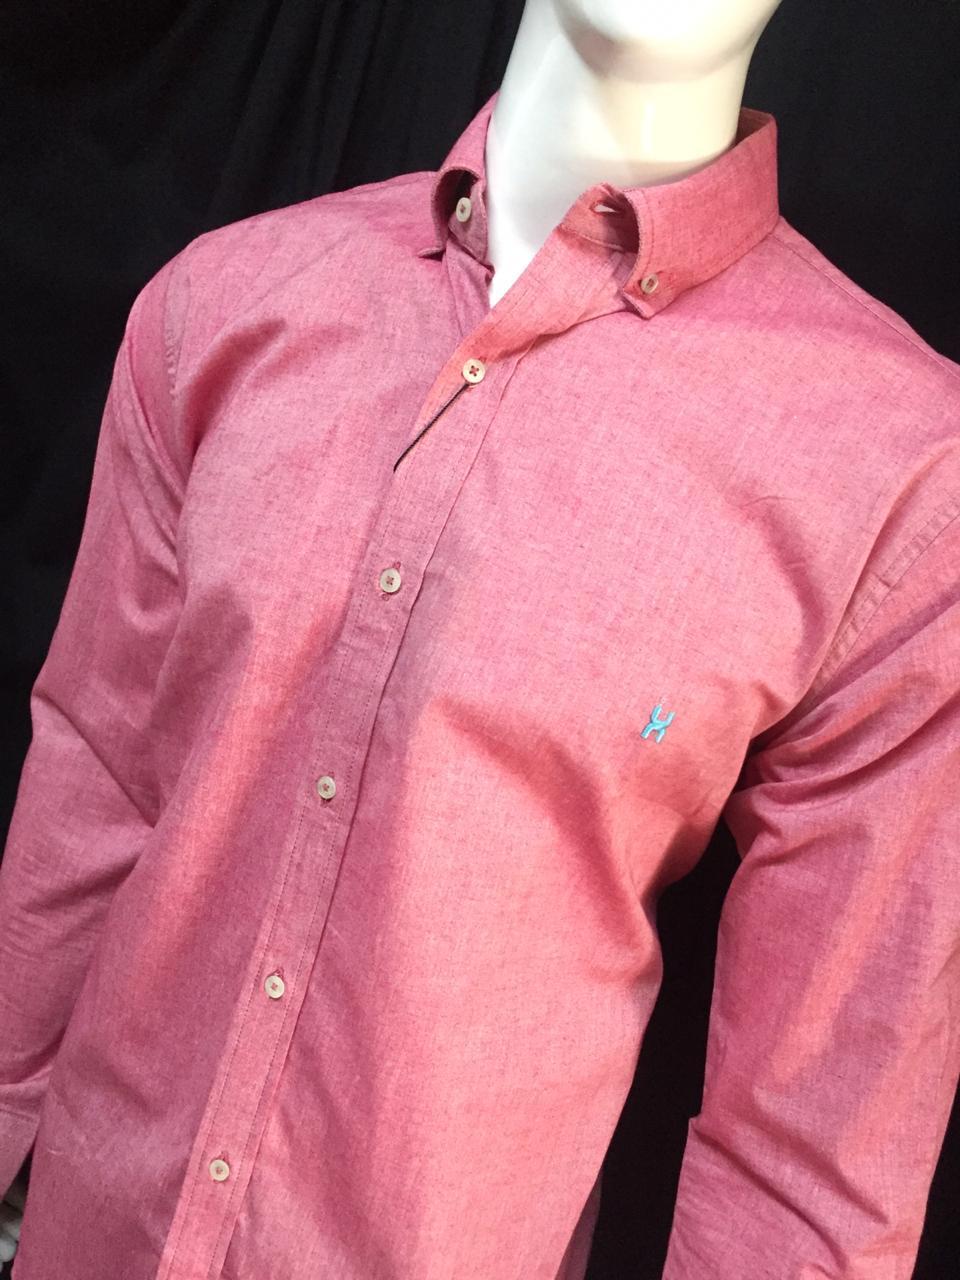 Camisa Masculina Txc Manga Longa Algodão Lisa - Vermelho